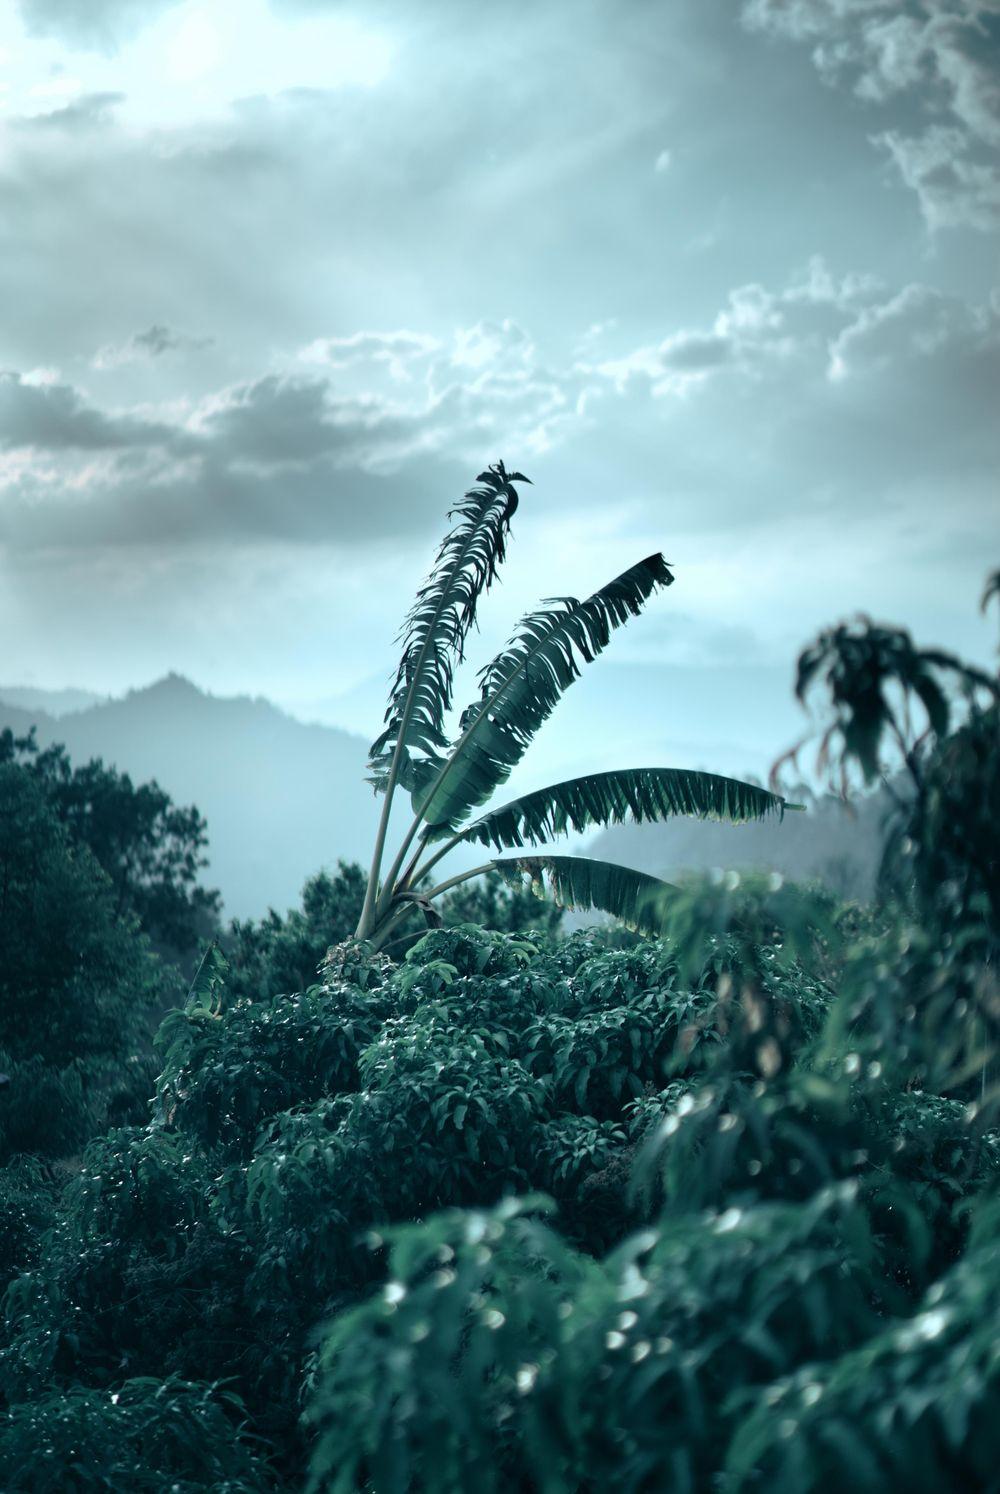 Landscape-Banana tree - image 1 - student project